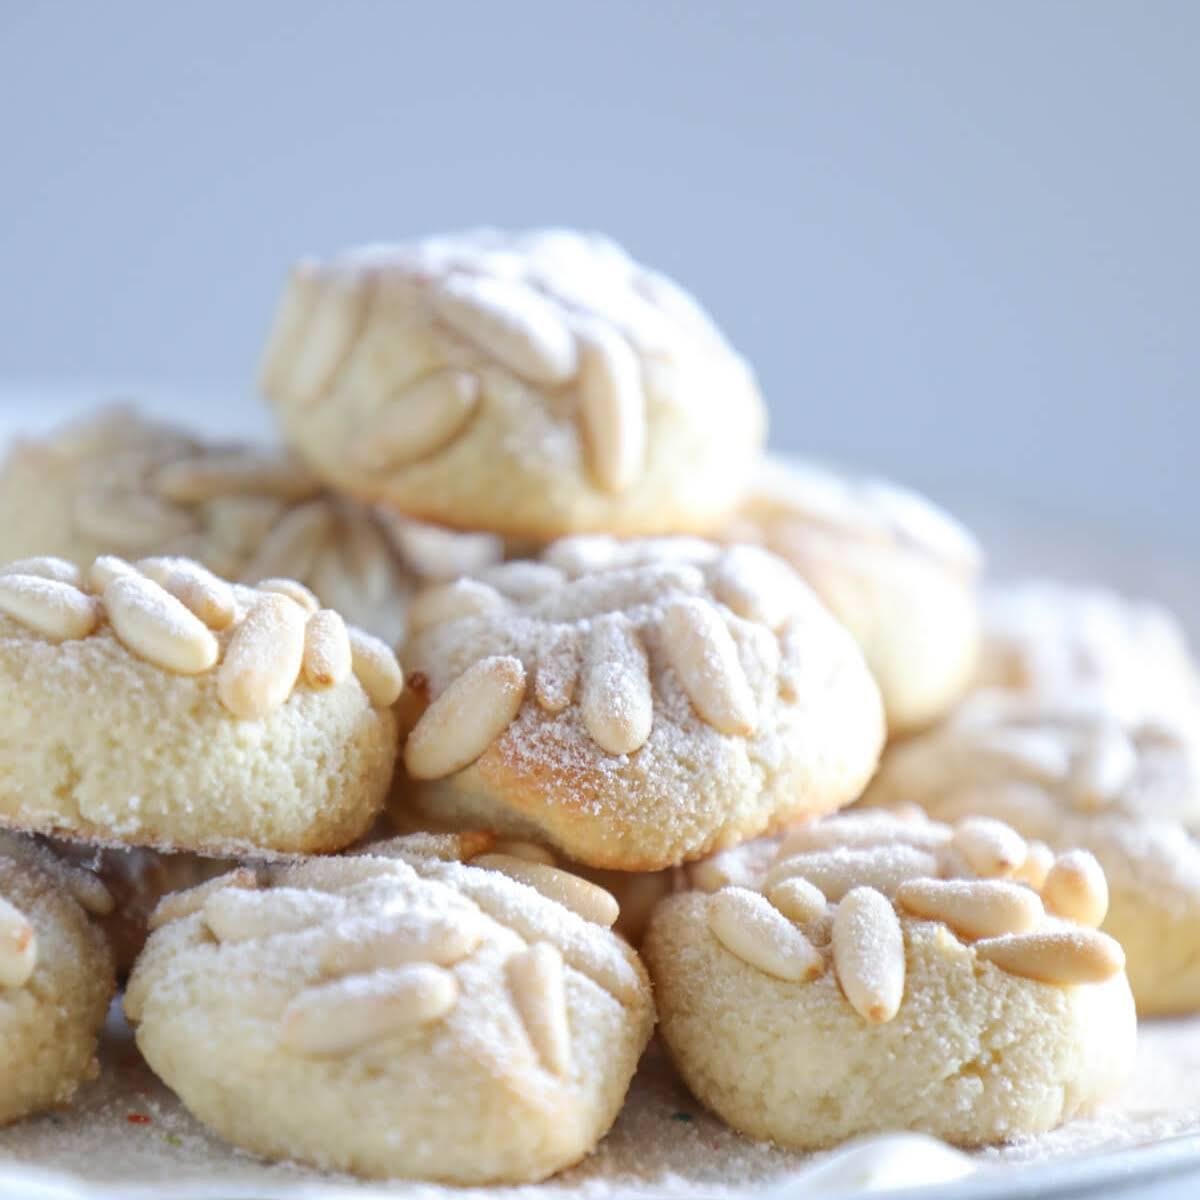 Keto Pignoli Cookies – Low Carb & Dairy Free